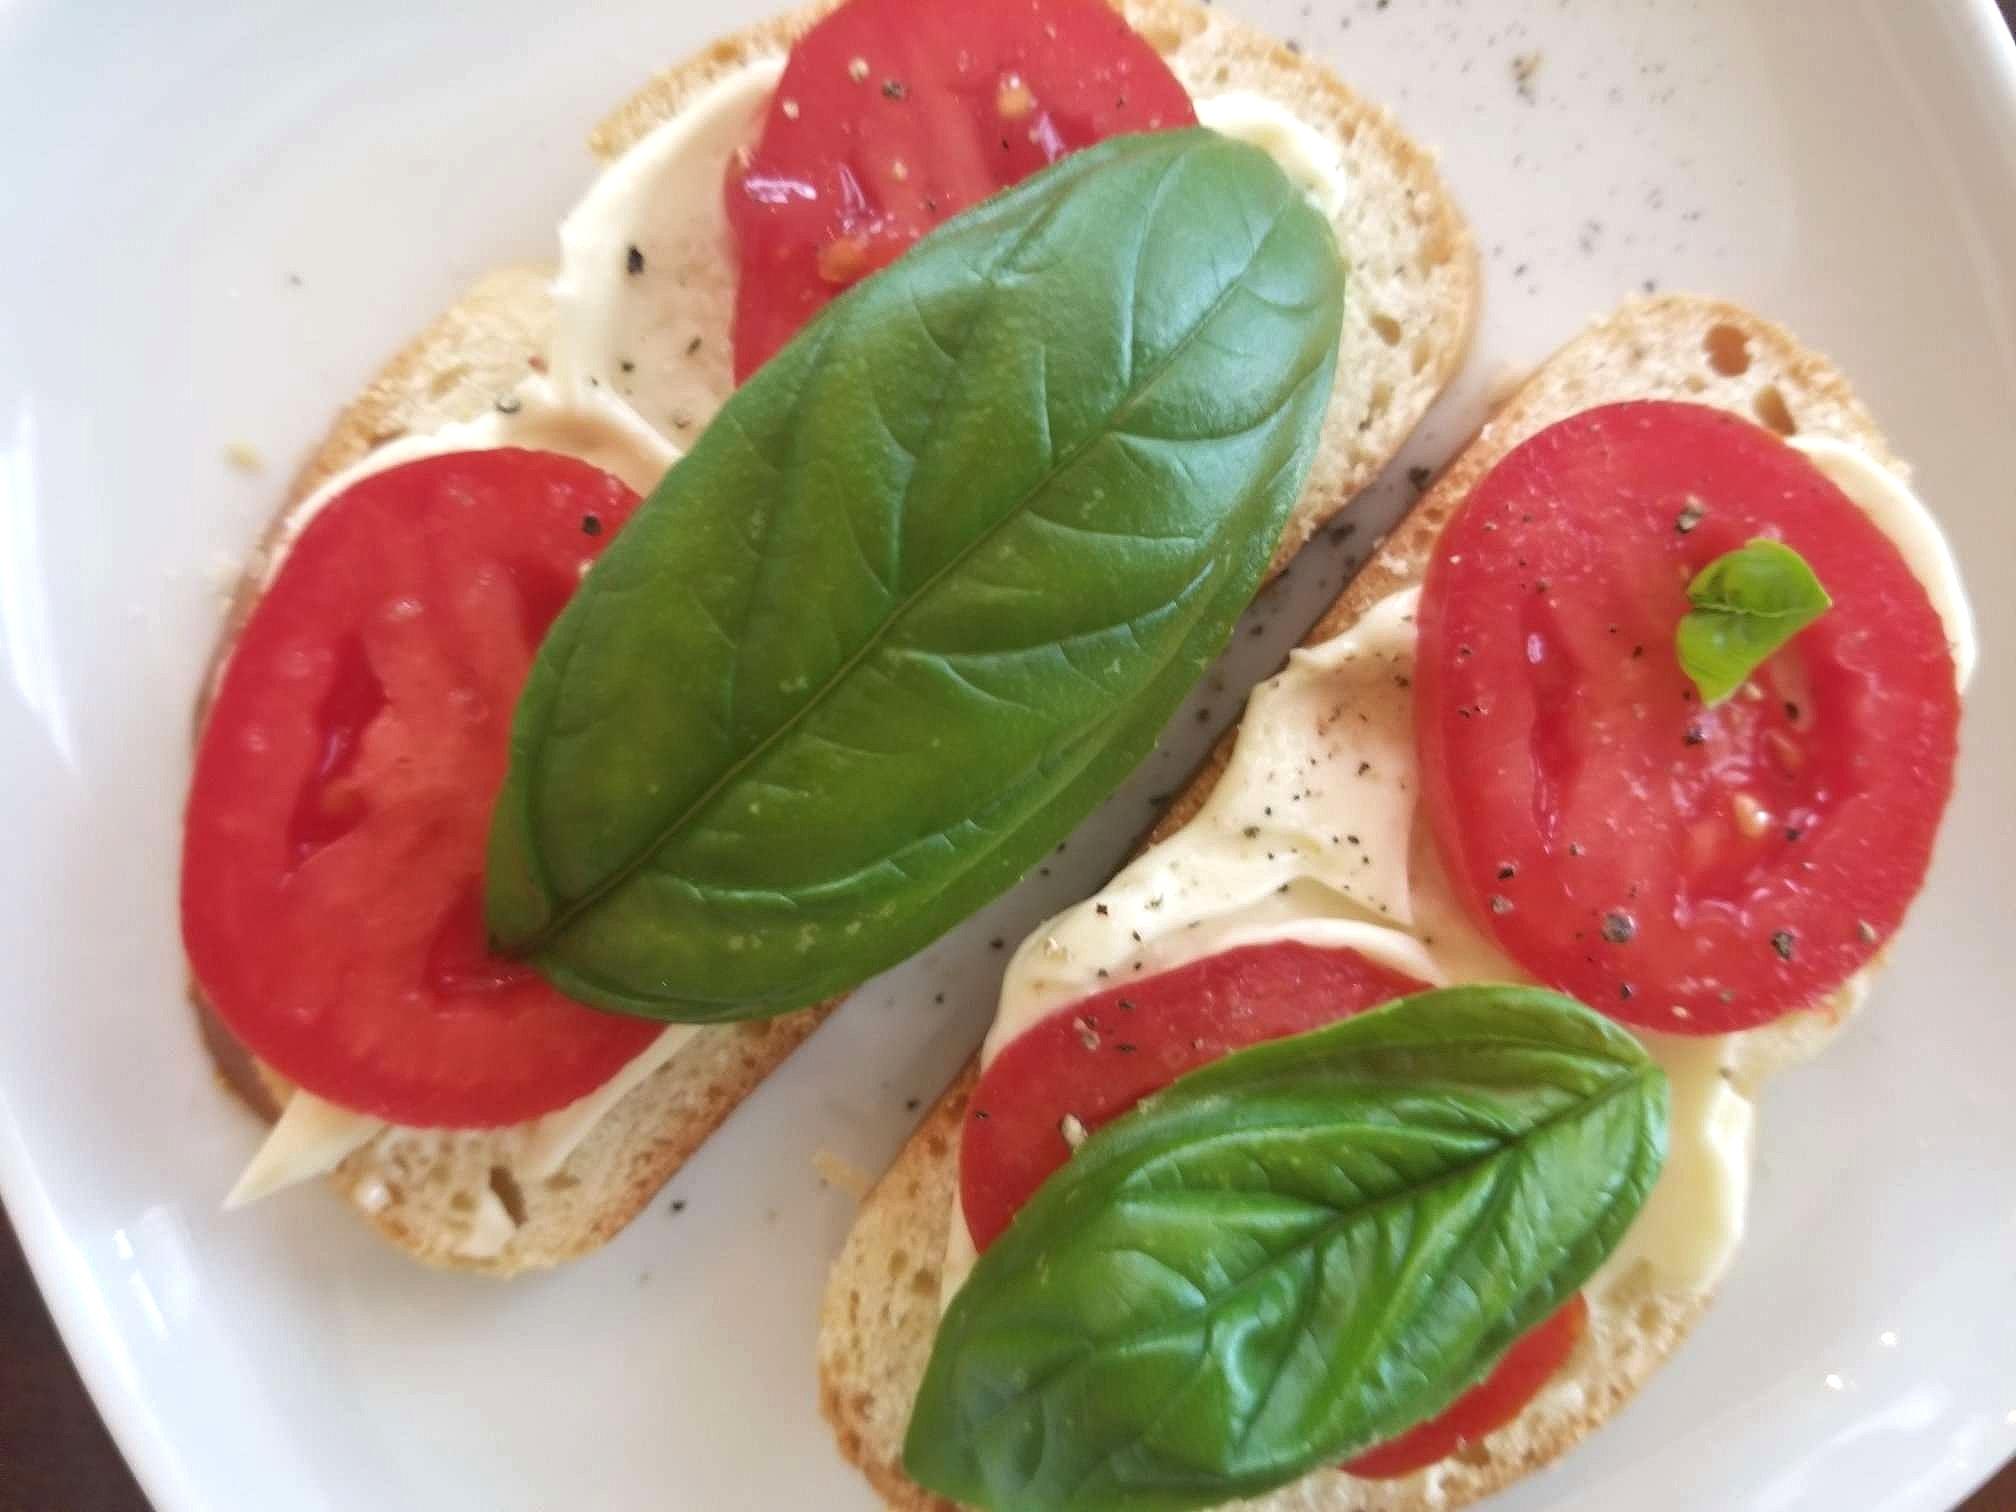 Challah Bread with Mayo, Tomato, and Fresh Basil